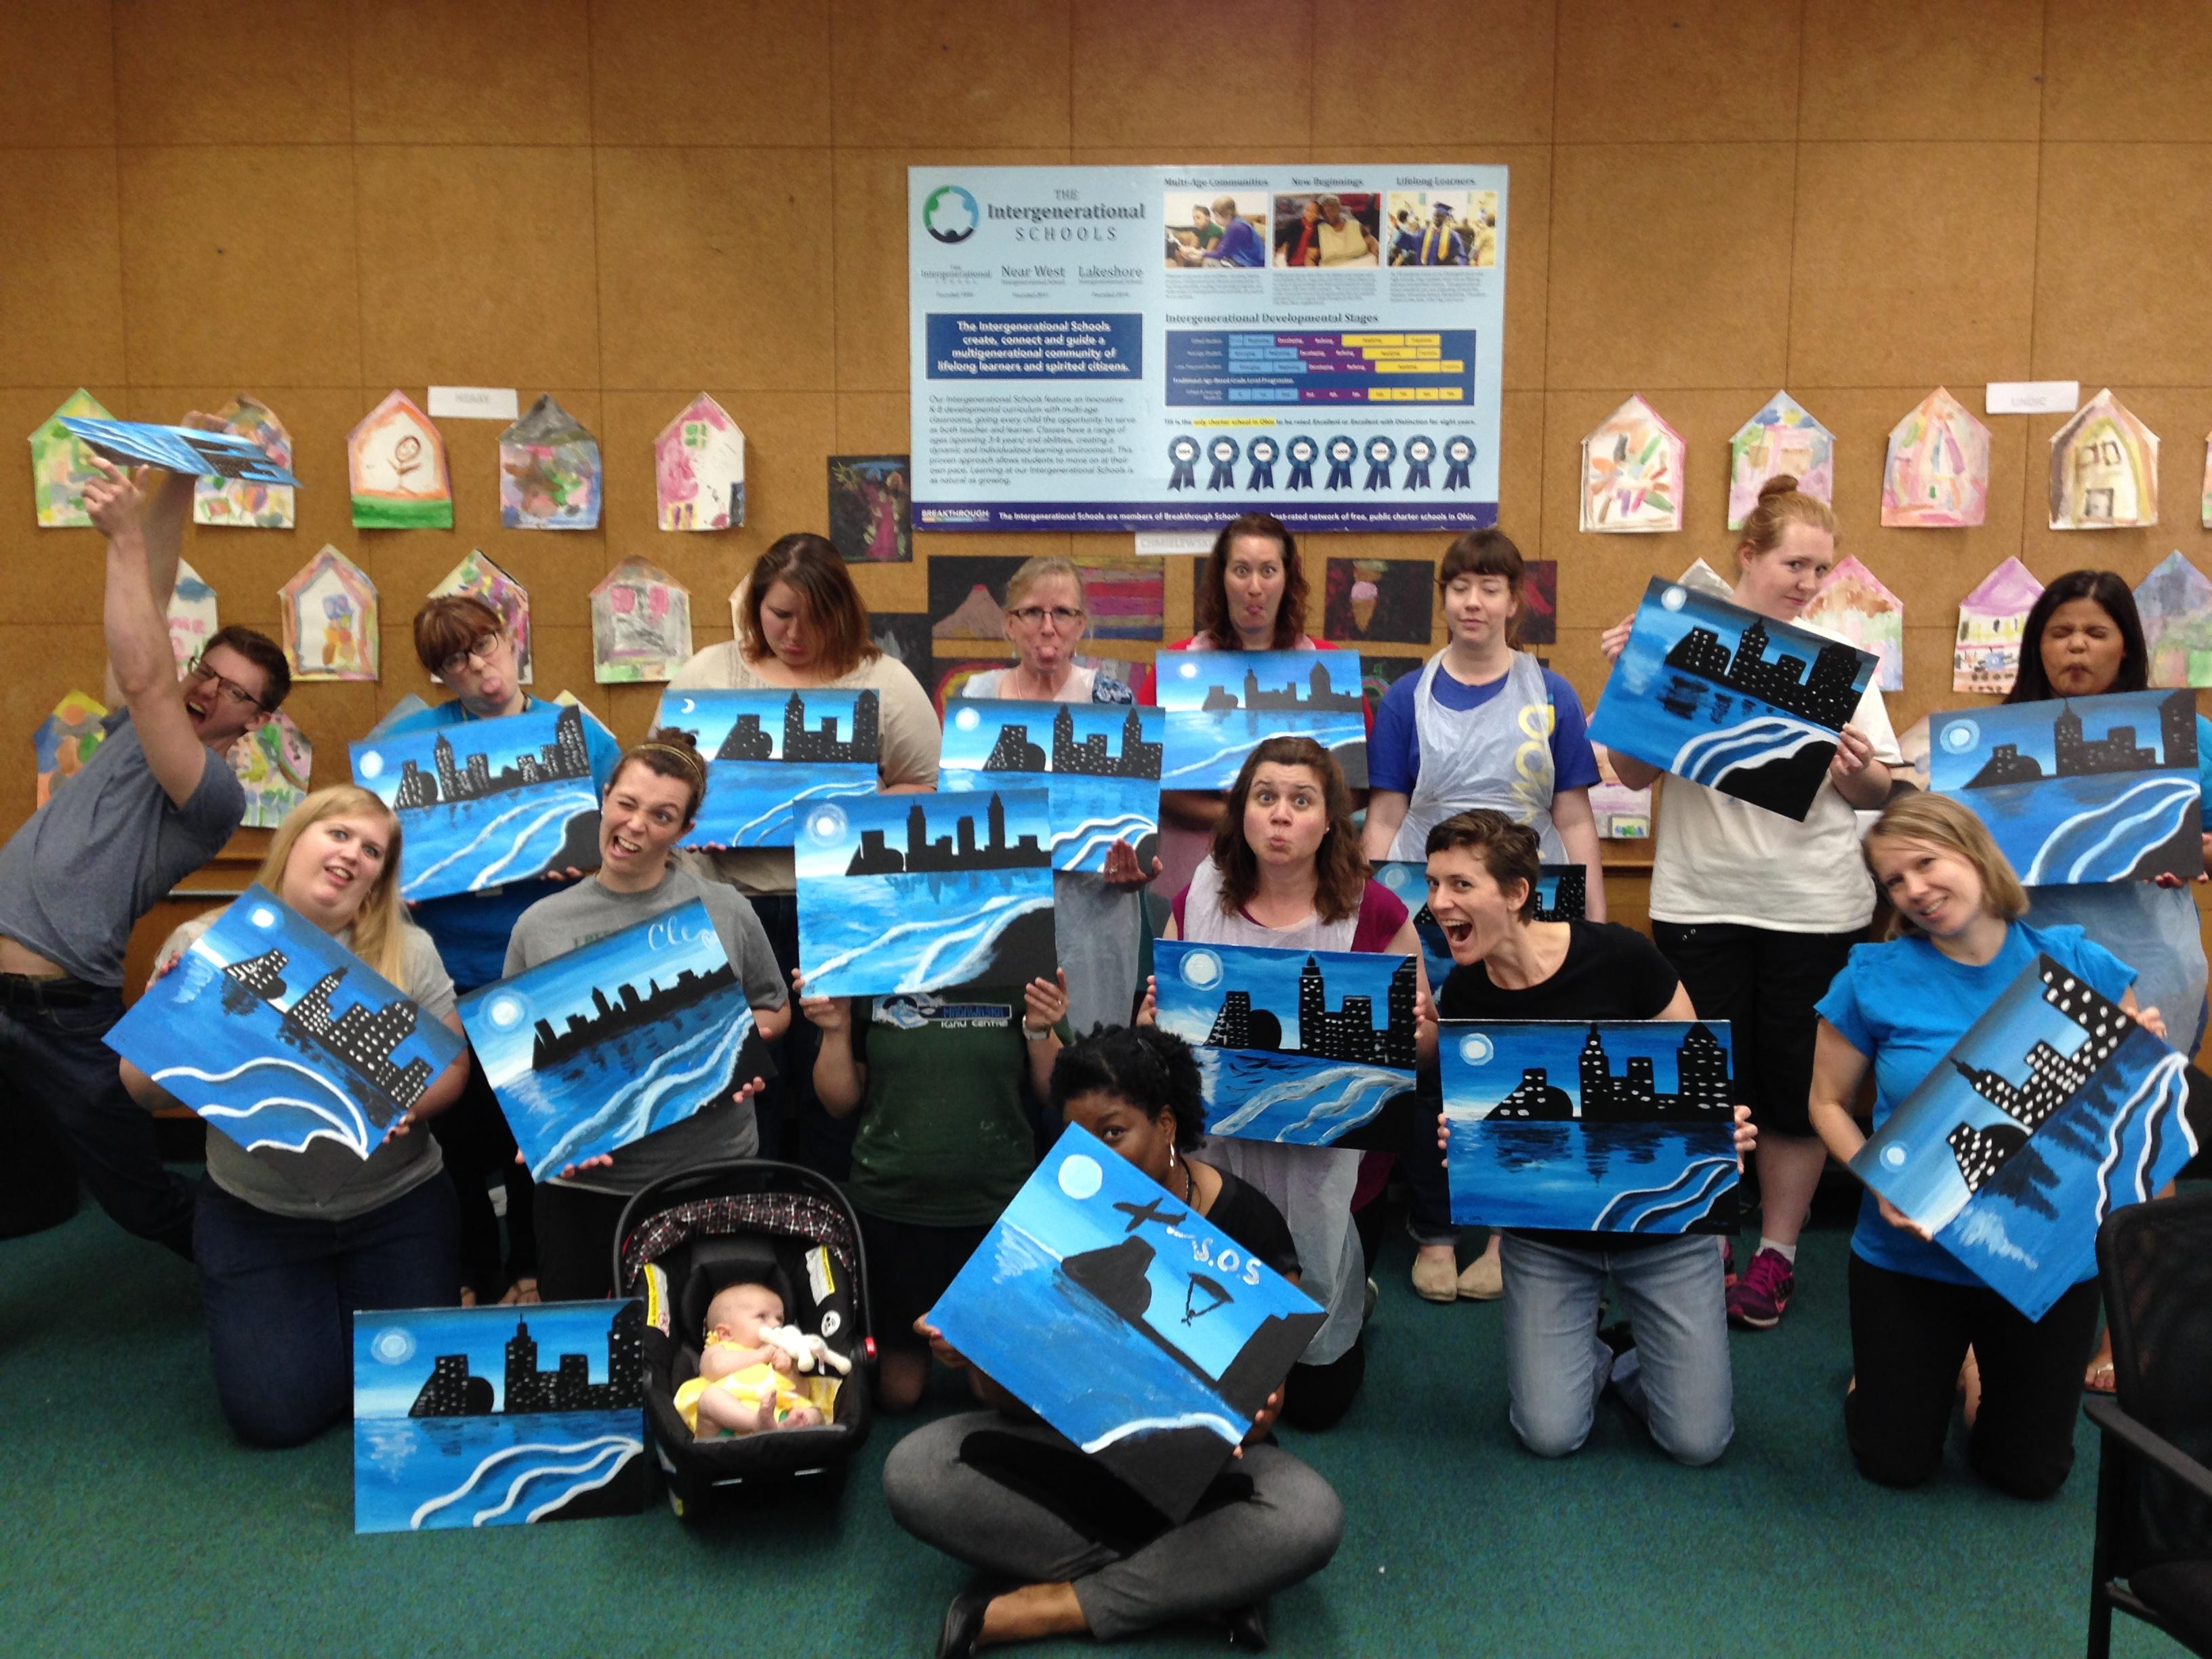 Lakeshore Intergenerational School Painting Event 6/2/16